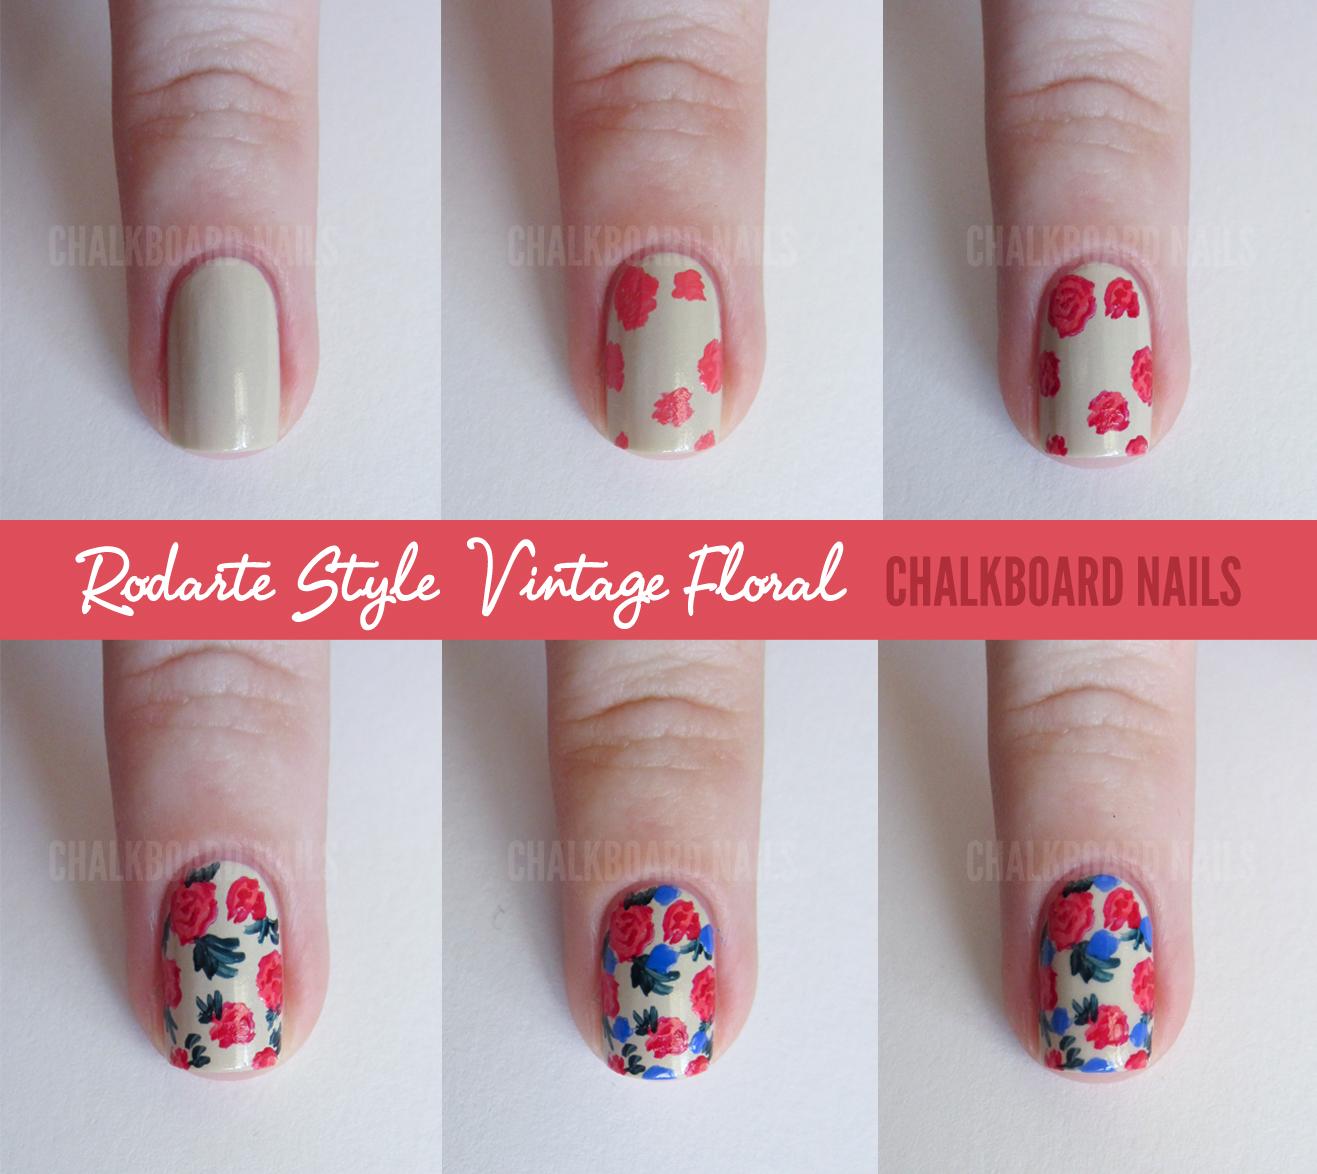 Another Flower Nail Tutorial: Sally Hansen X Rodarte Tie Dye And Floral Mix (+ Tutorial